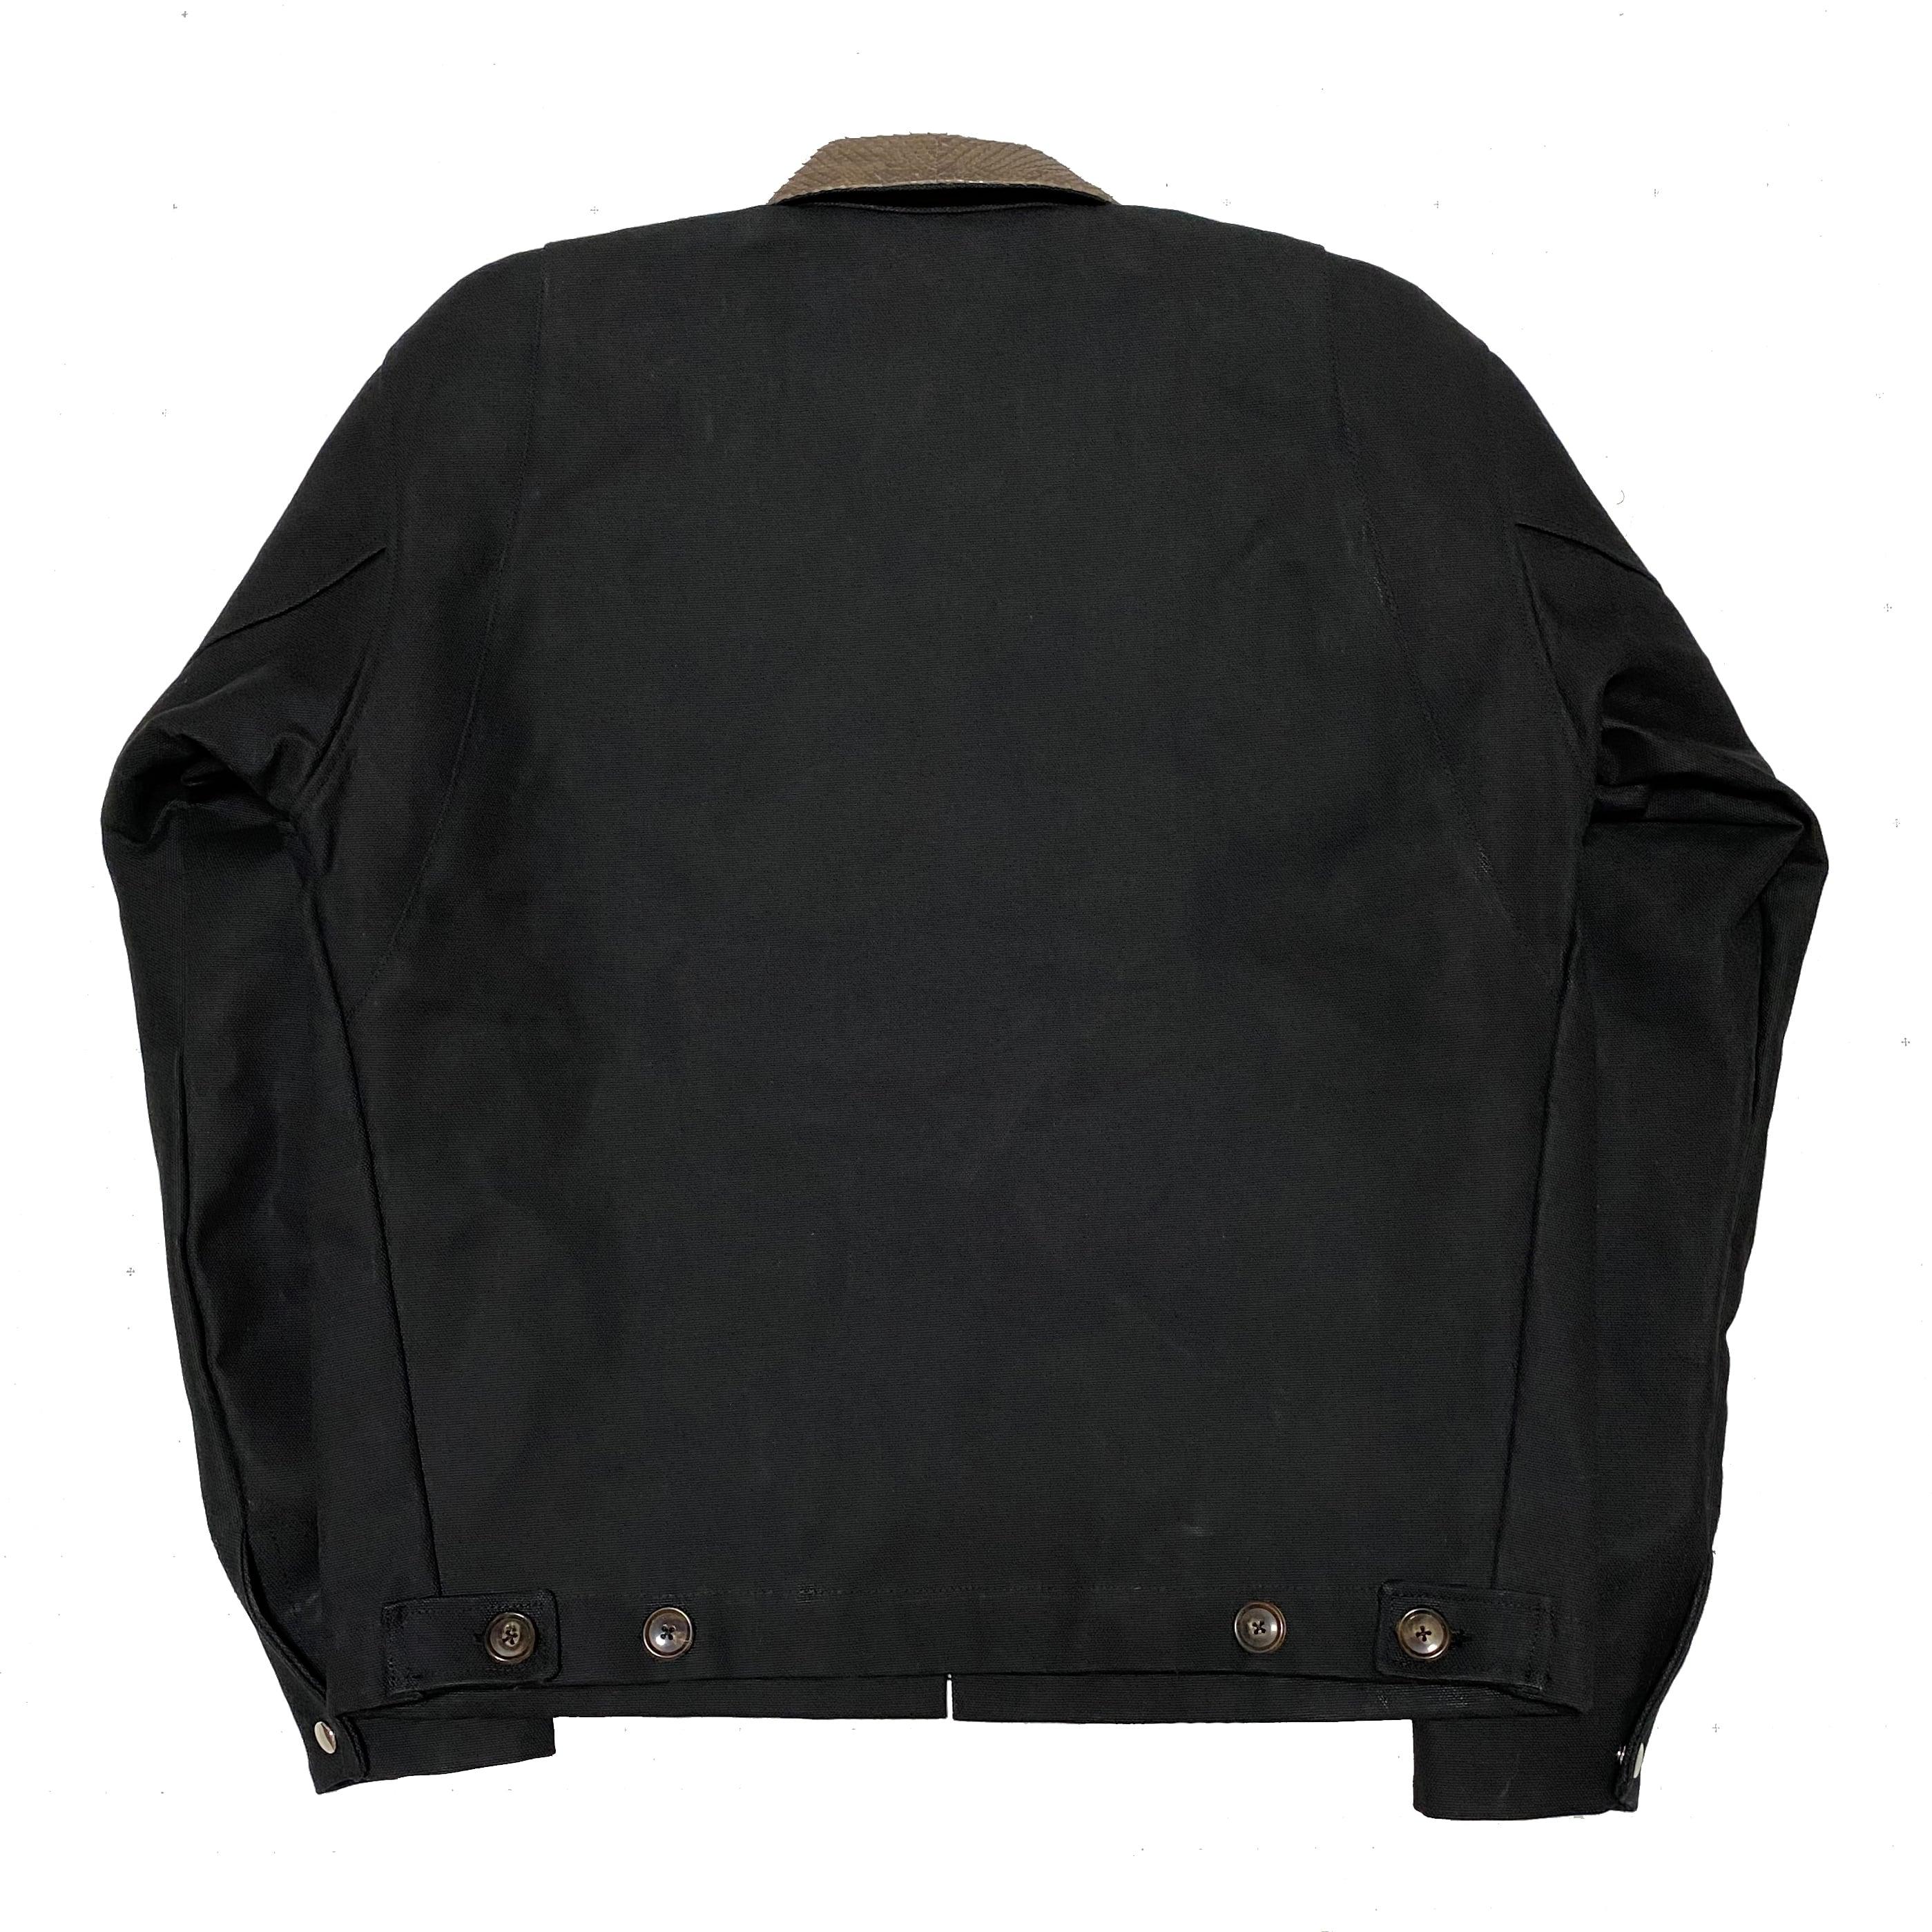 Petroit Work Jacket / Black - 画像2